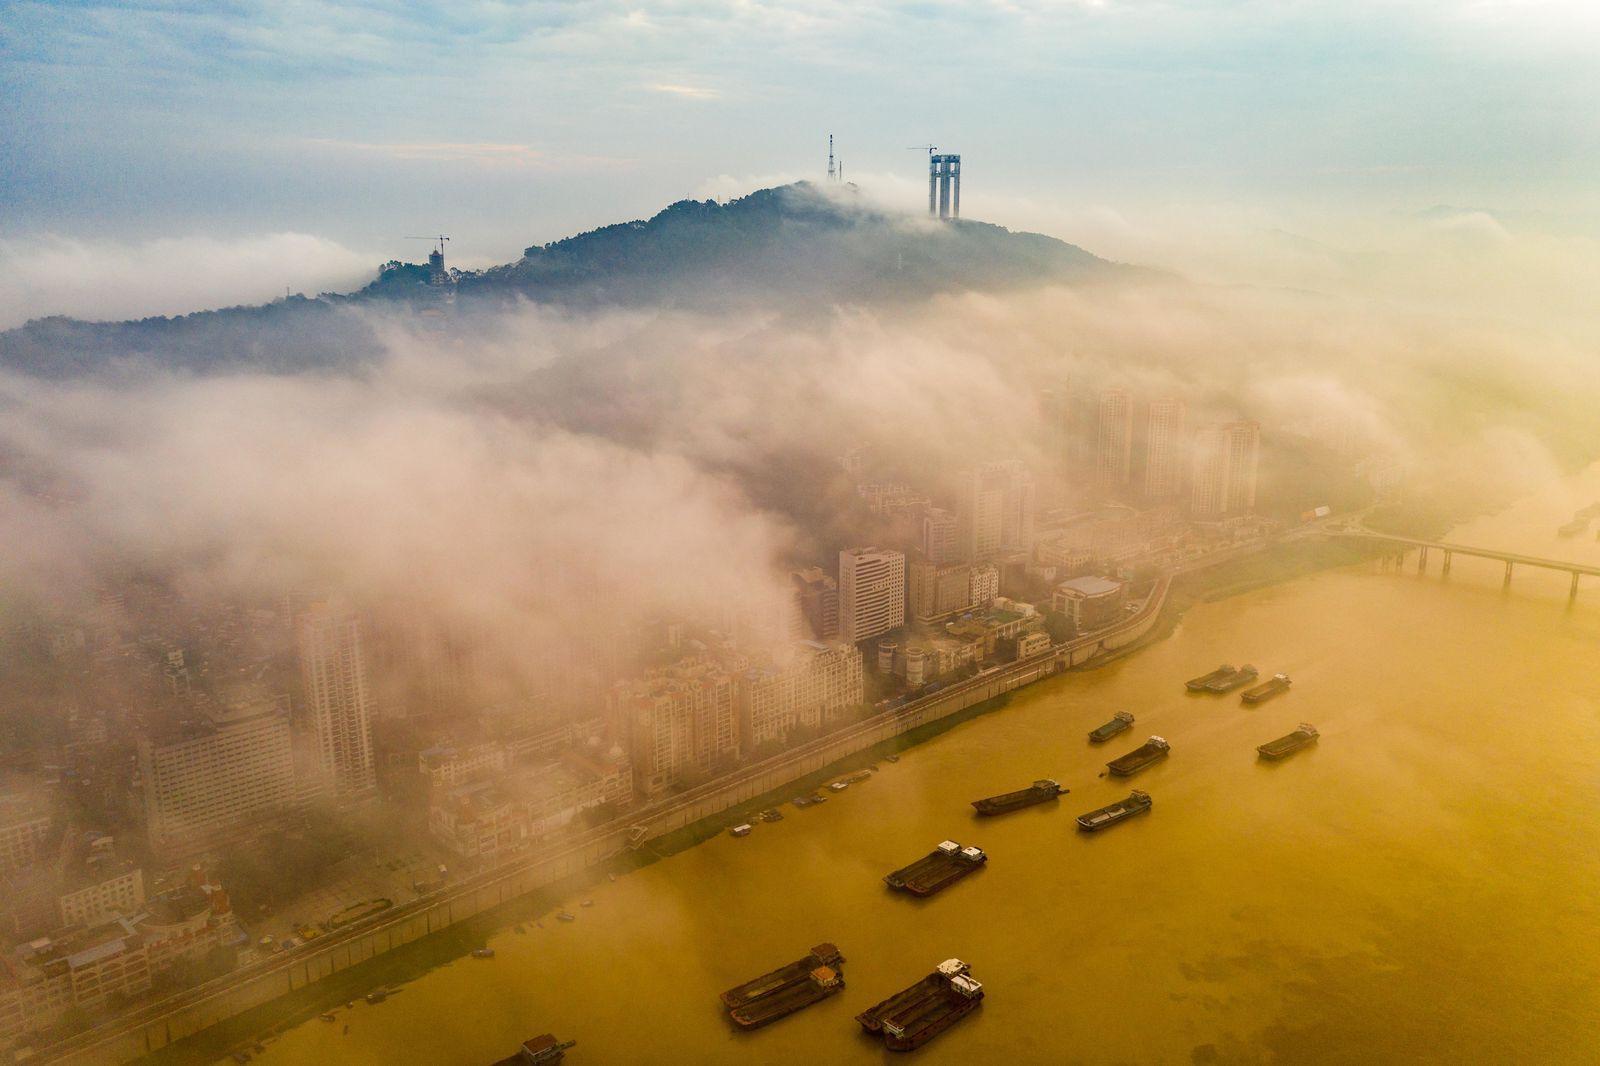 Frachtschiffe auf dem Xi Jiang